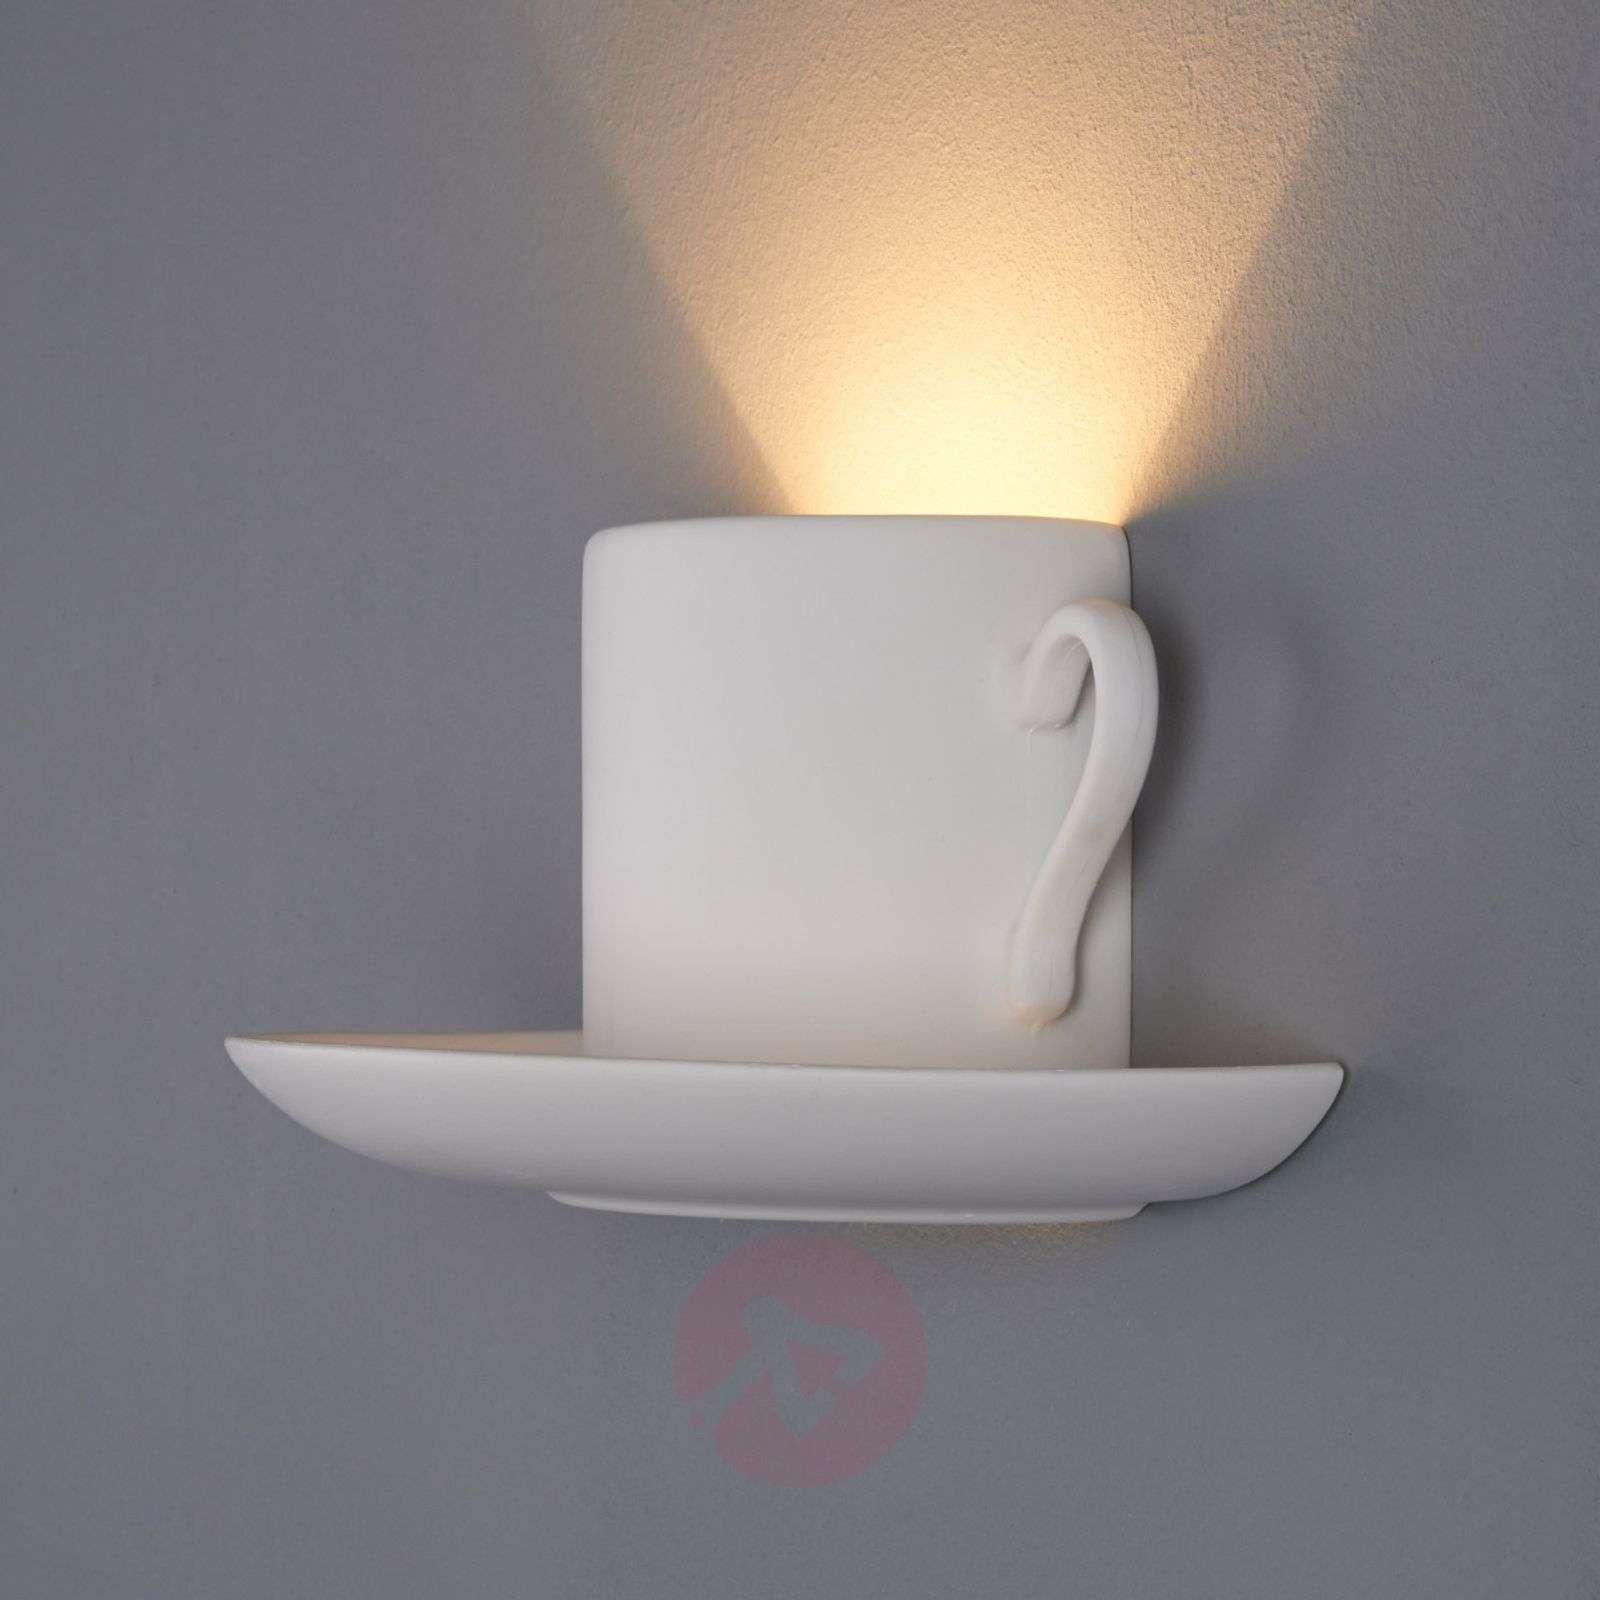 Pocillo Wall Light Paintable Plaster-9613021-01